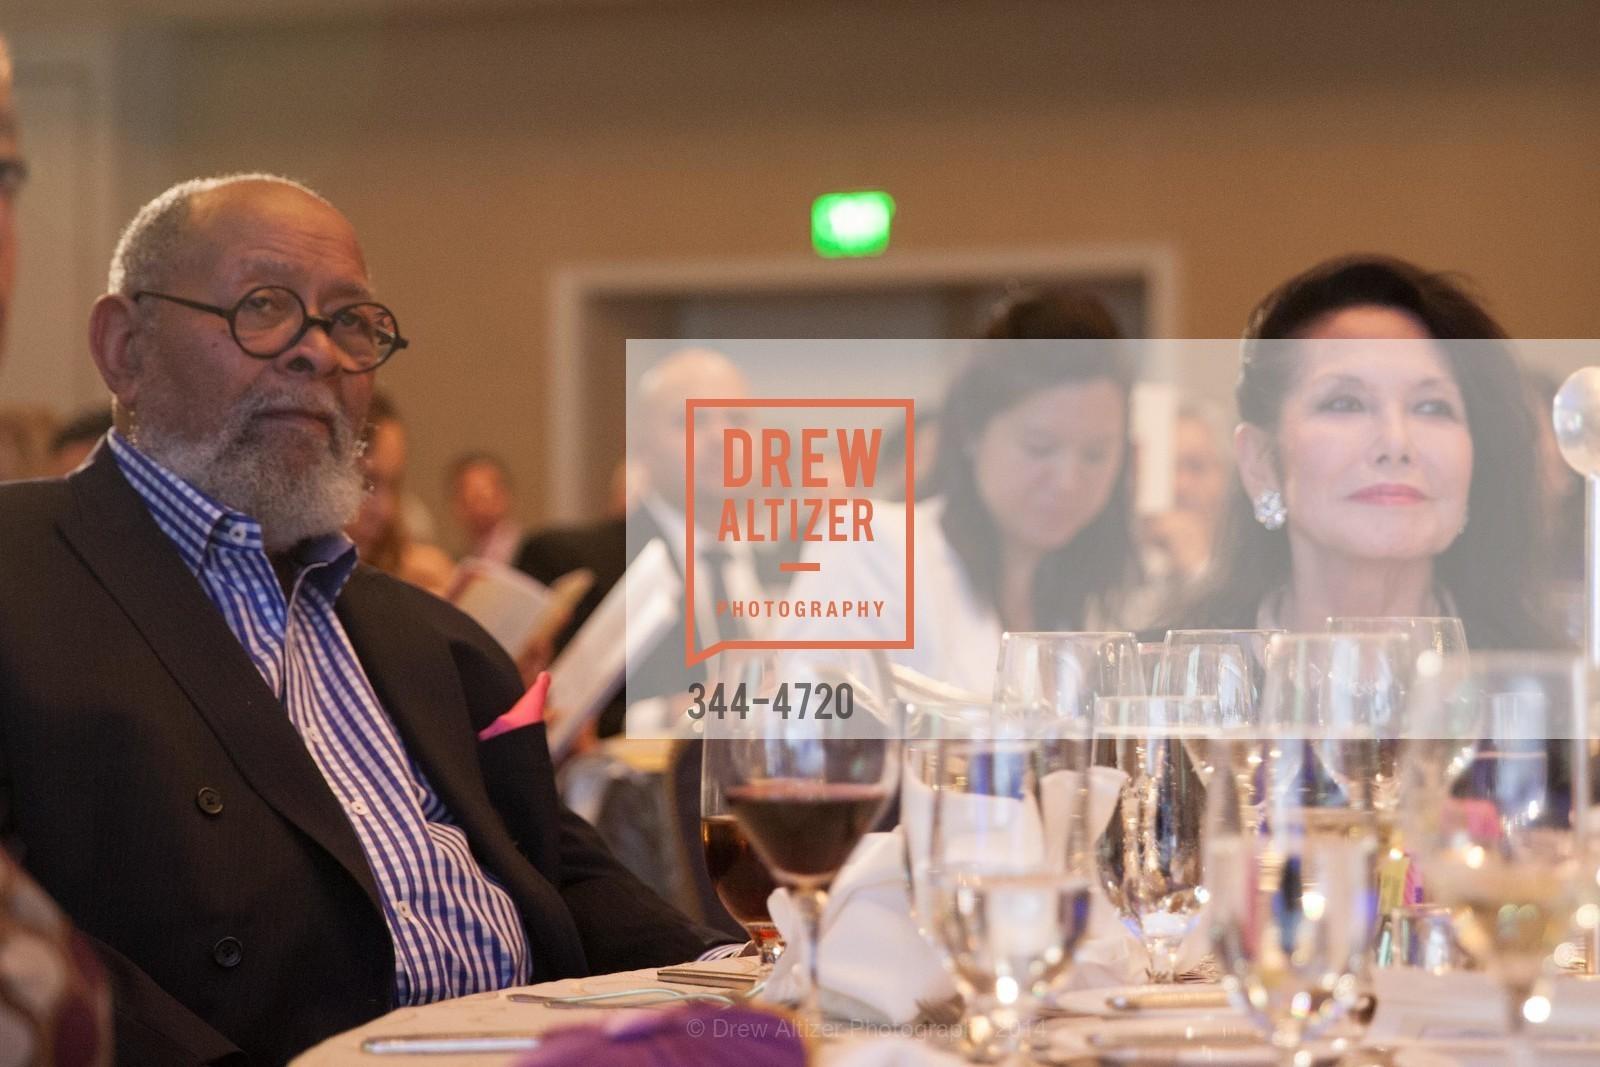 Cecil Williams, Janice Mirikitani, Photo #344-4720